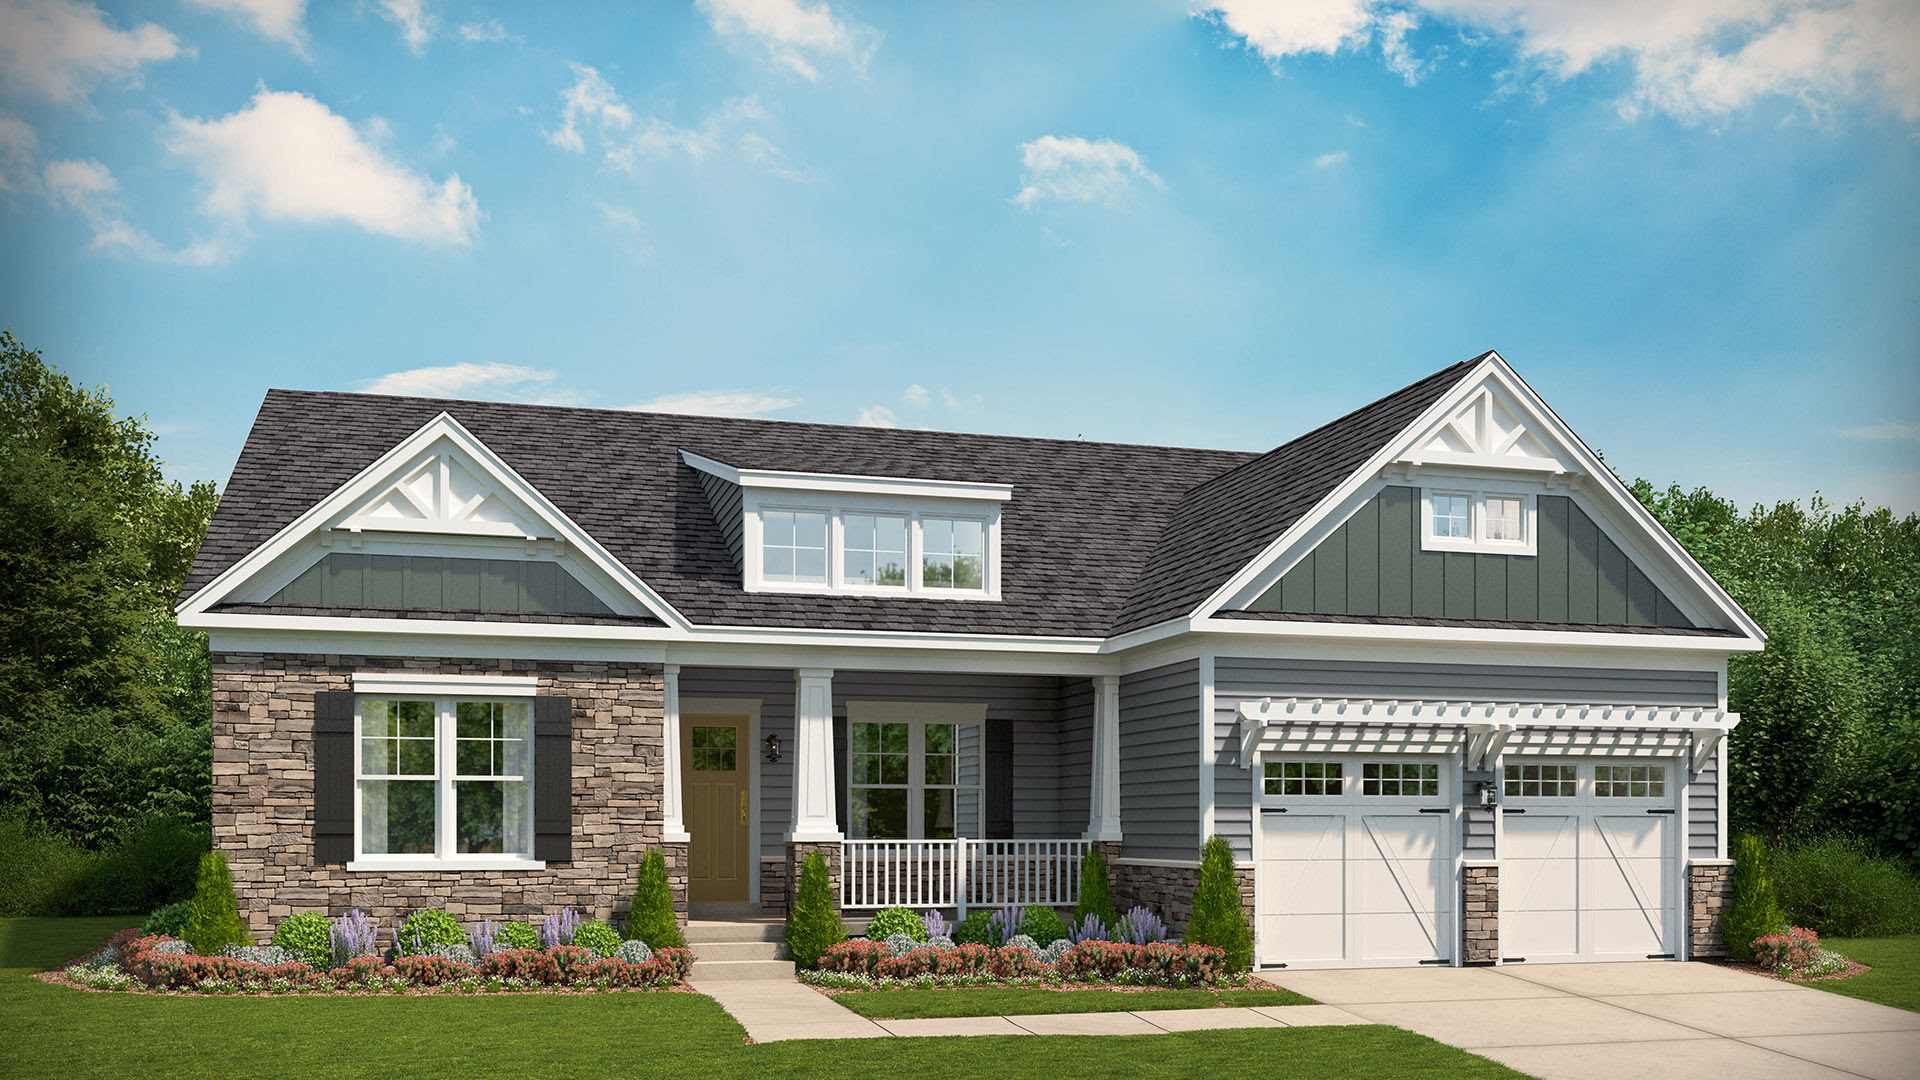 Charlottesville homes for sale  Homes for sale in Charlottesville VA  HomeGain